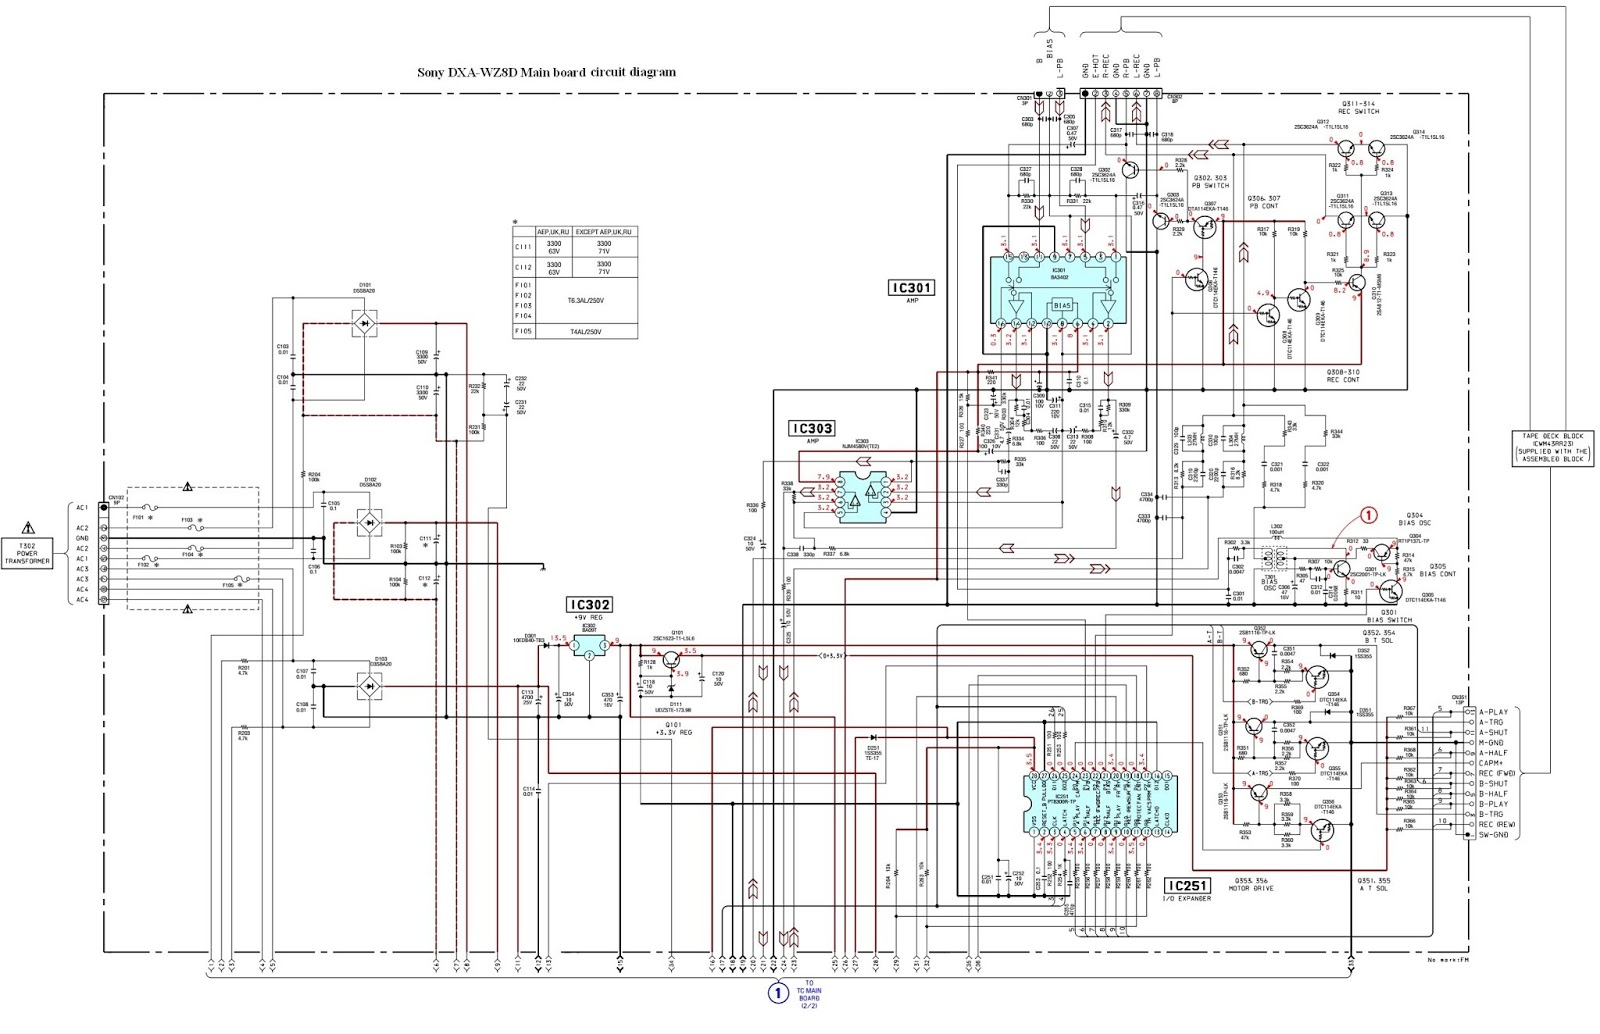 sony dxa wz8d main board circuit diagram 1of 2 [ 1600 x 1034 Pixel ]